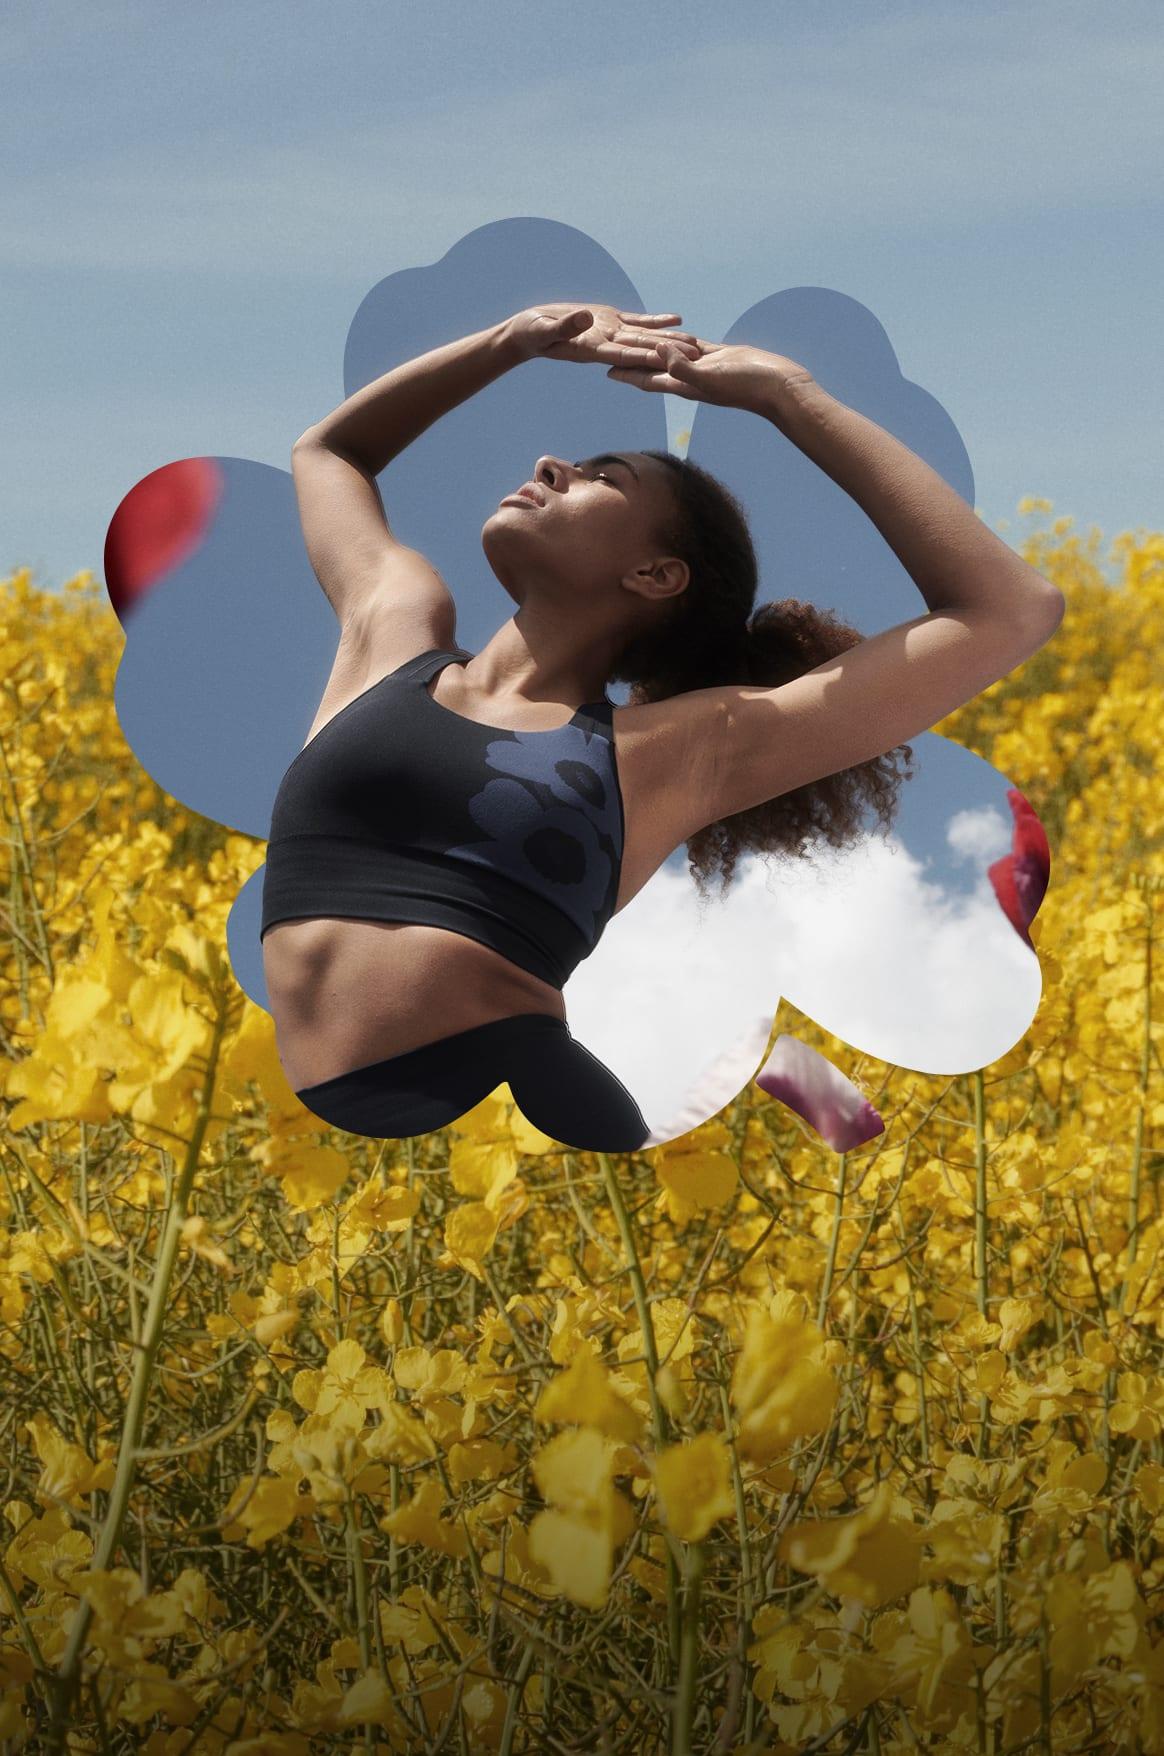 Female stretching in field wearing adidas marimekko